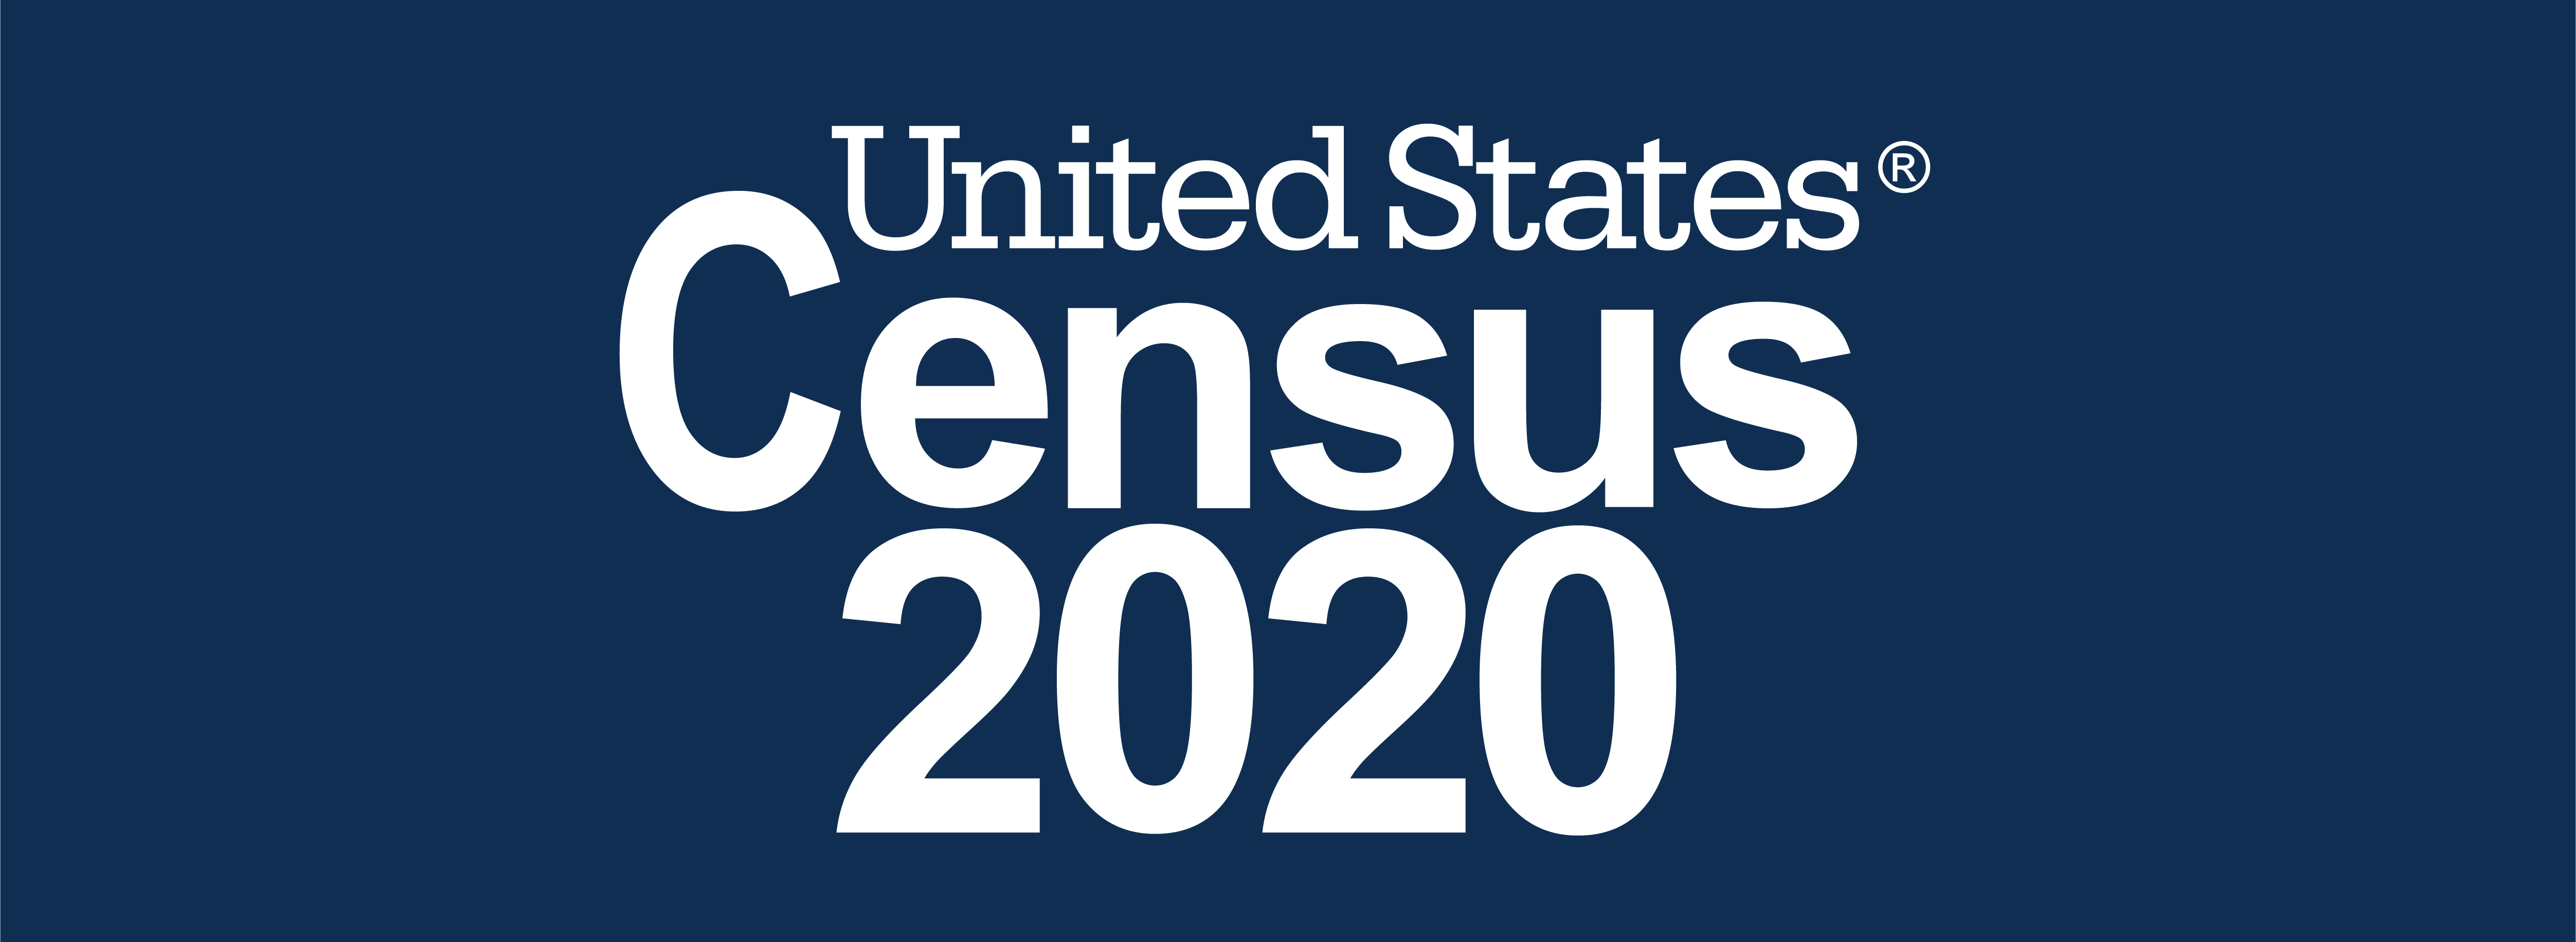 SharingCards-CensusBureauLogos1200x628